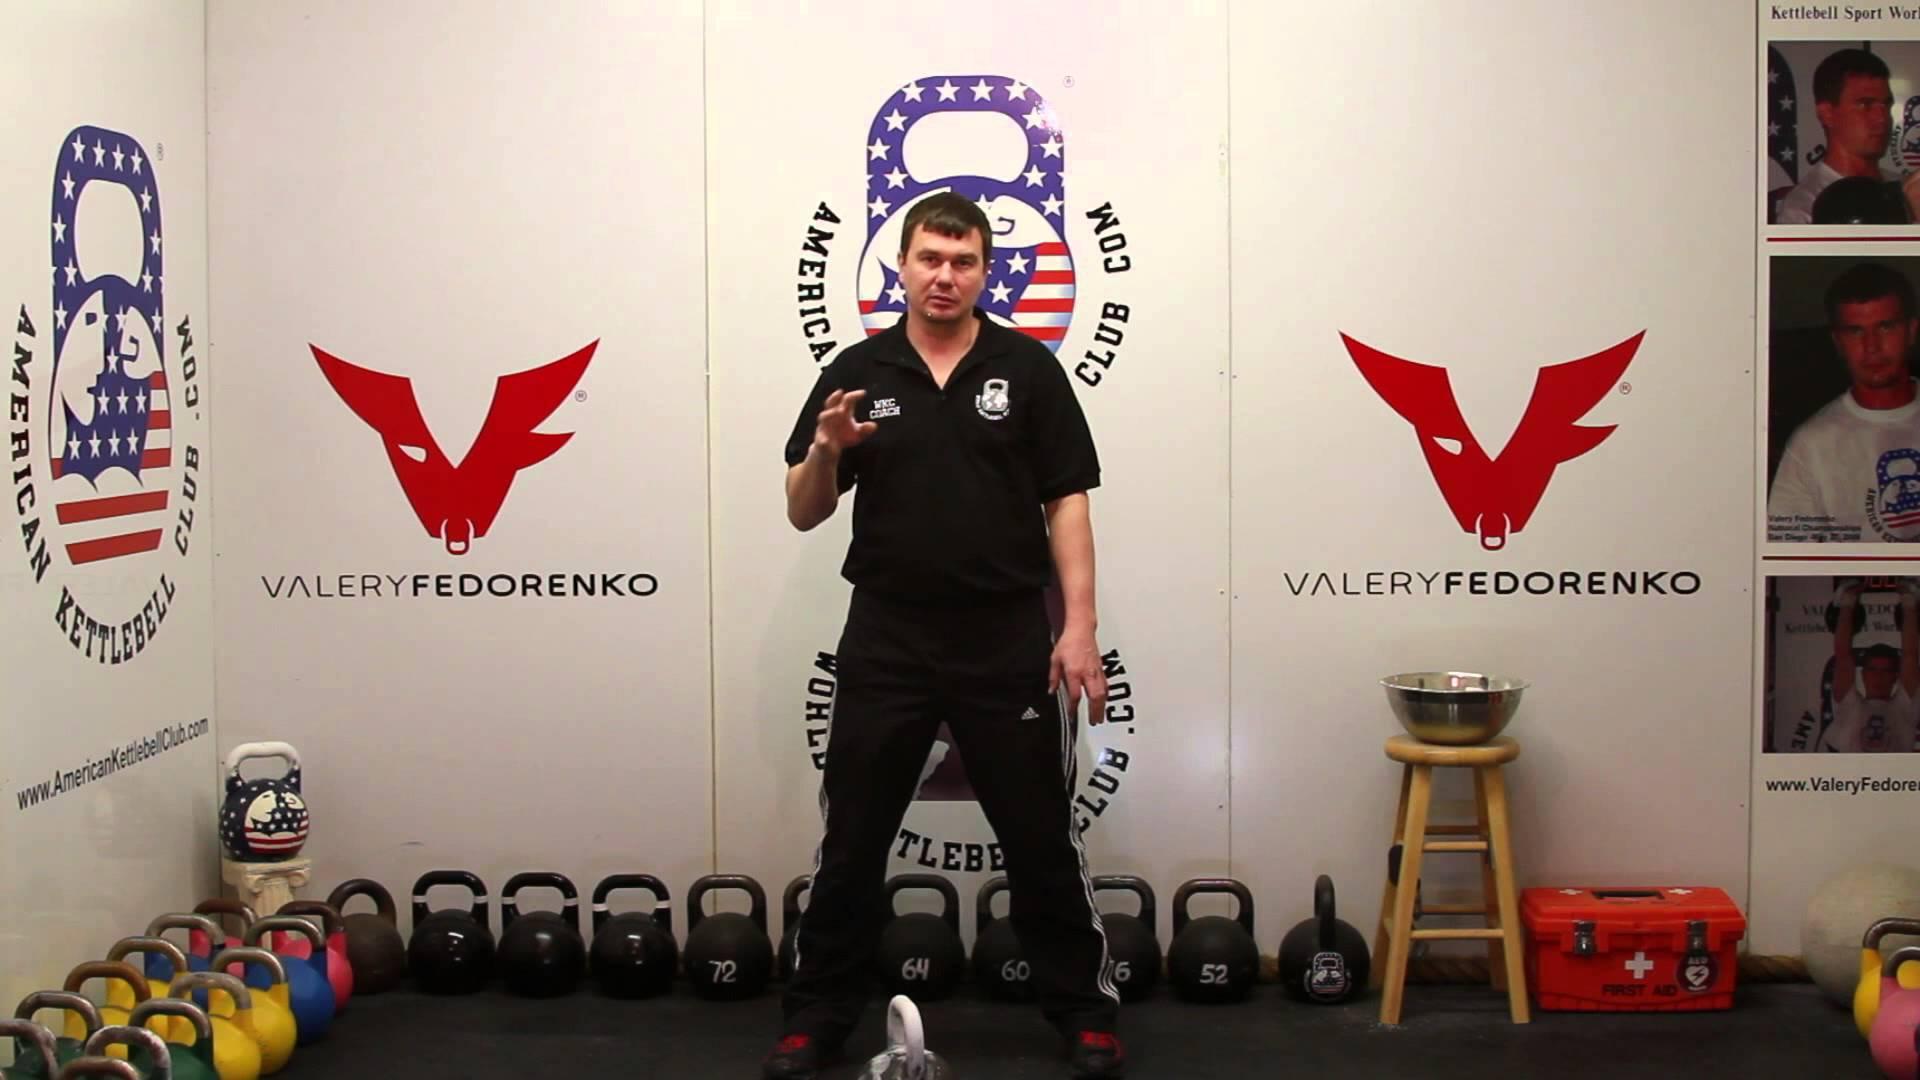 Valery Fedorenko